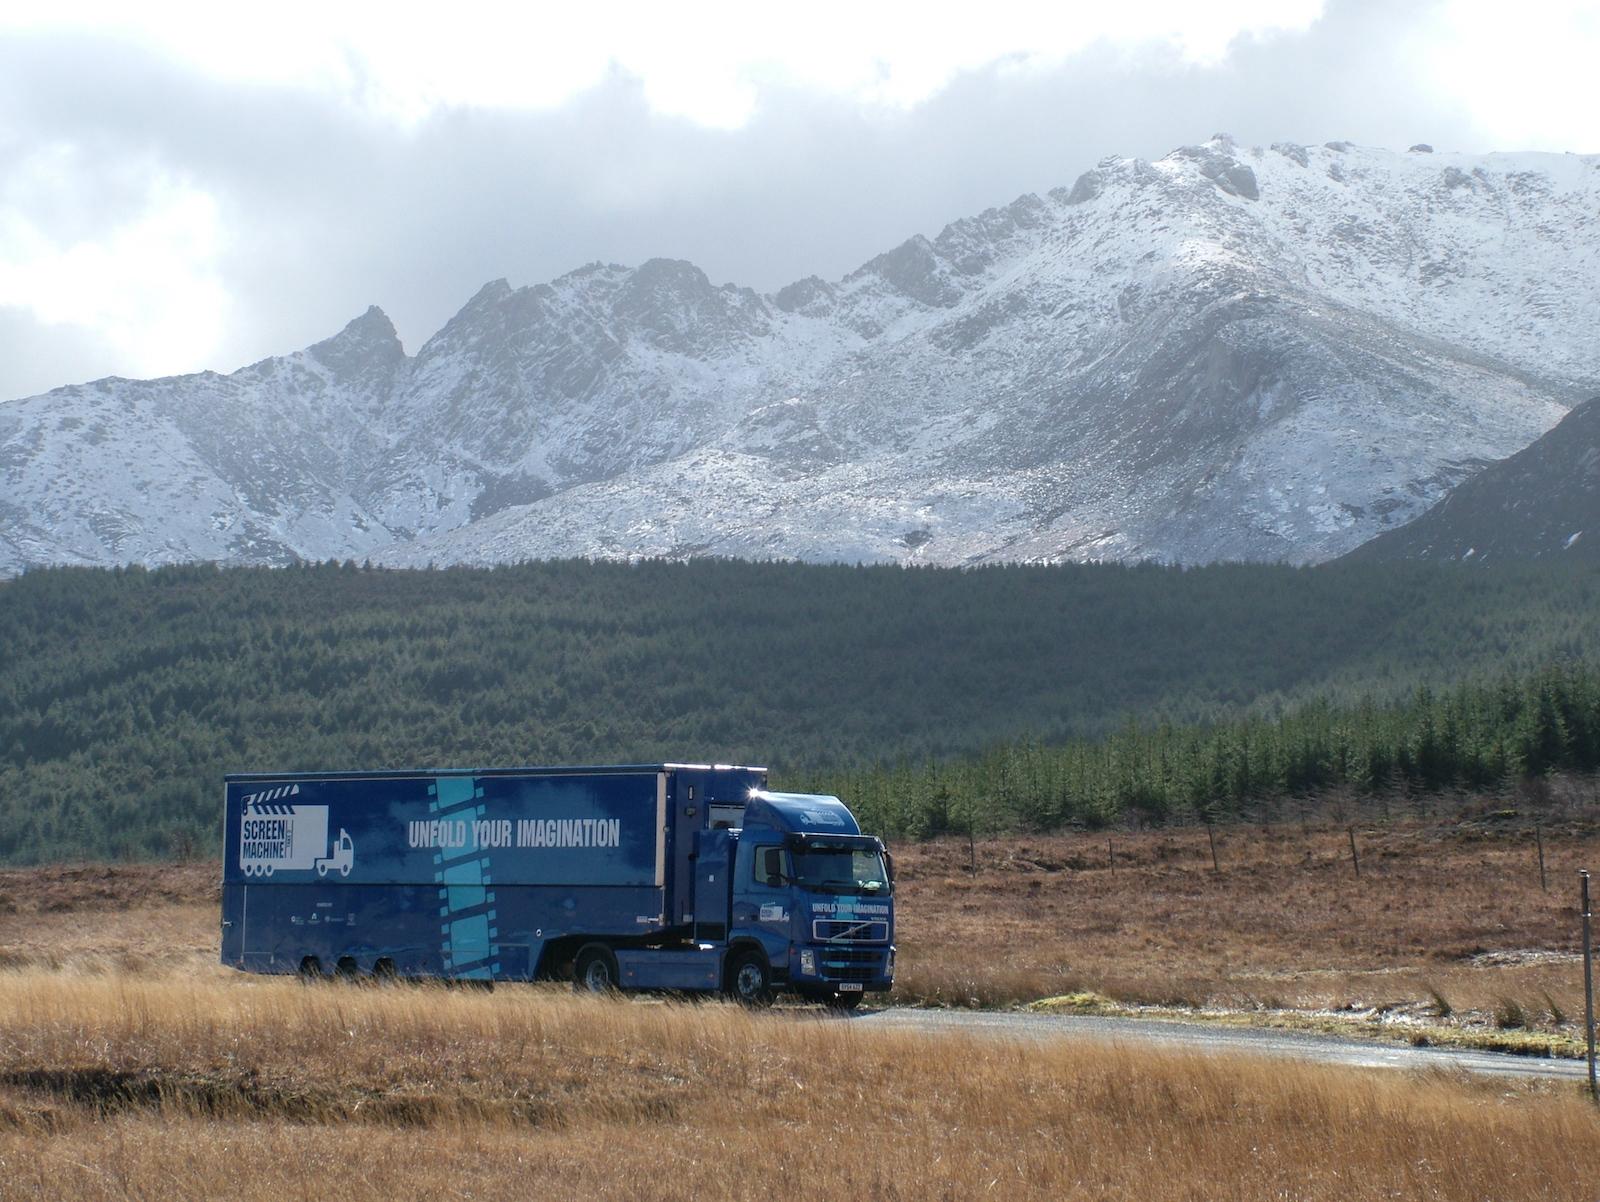 Screen Machine on the road